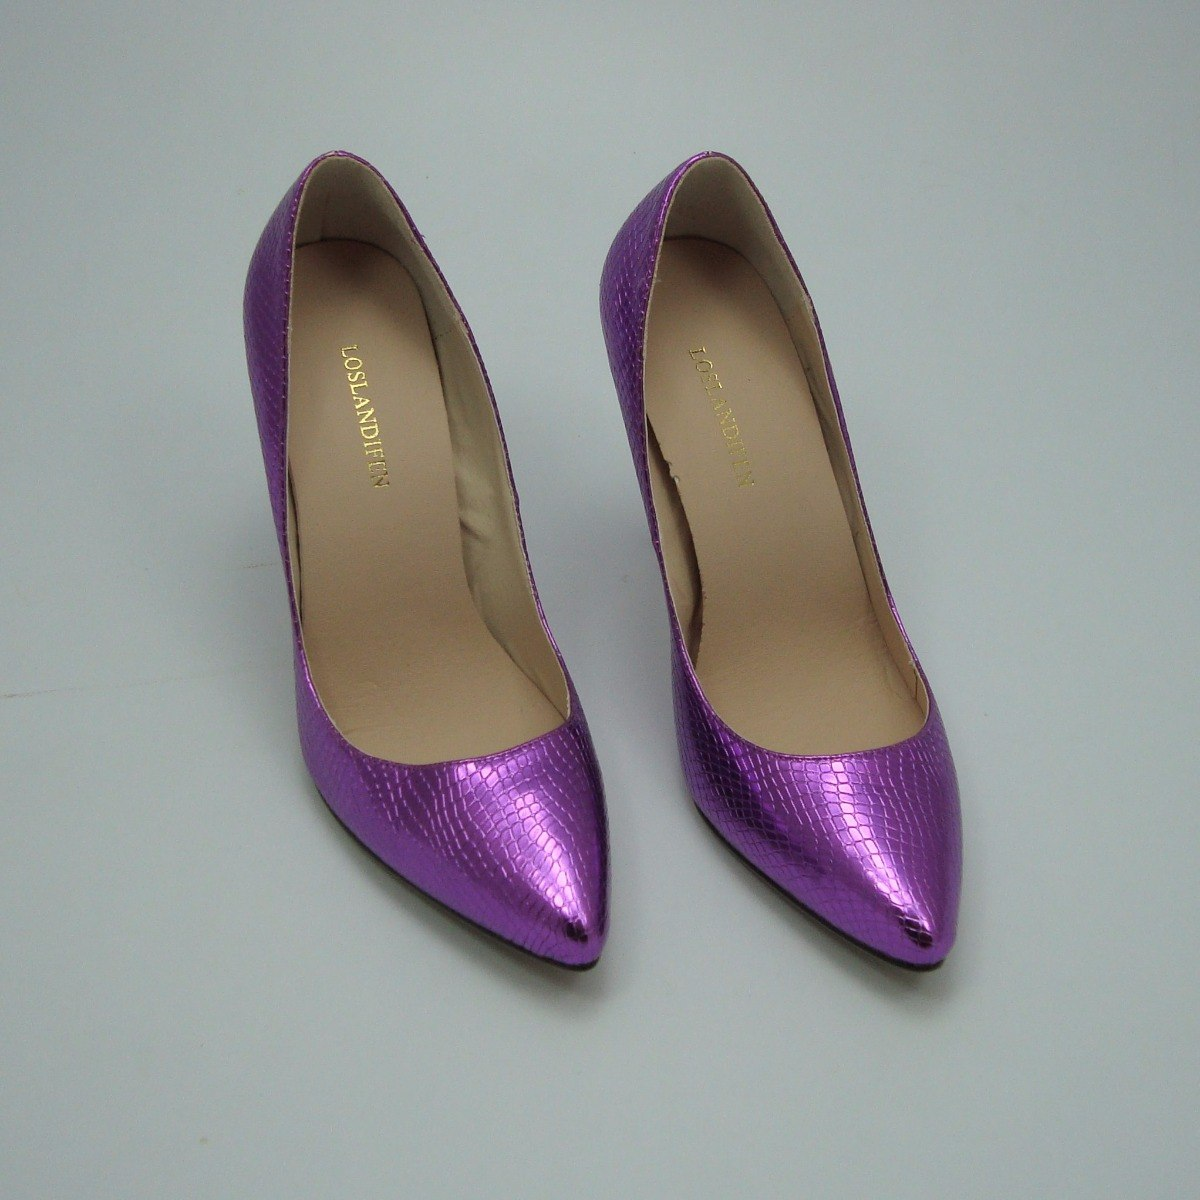 6d2416ea zapatos-sexys-de-mujer -color-morado-D_NQ_NP_868825-MLM25829920368_082017-F.jpg